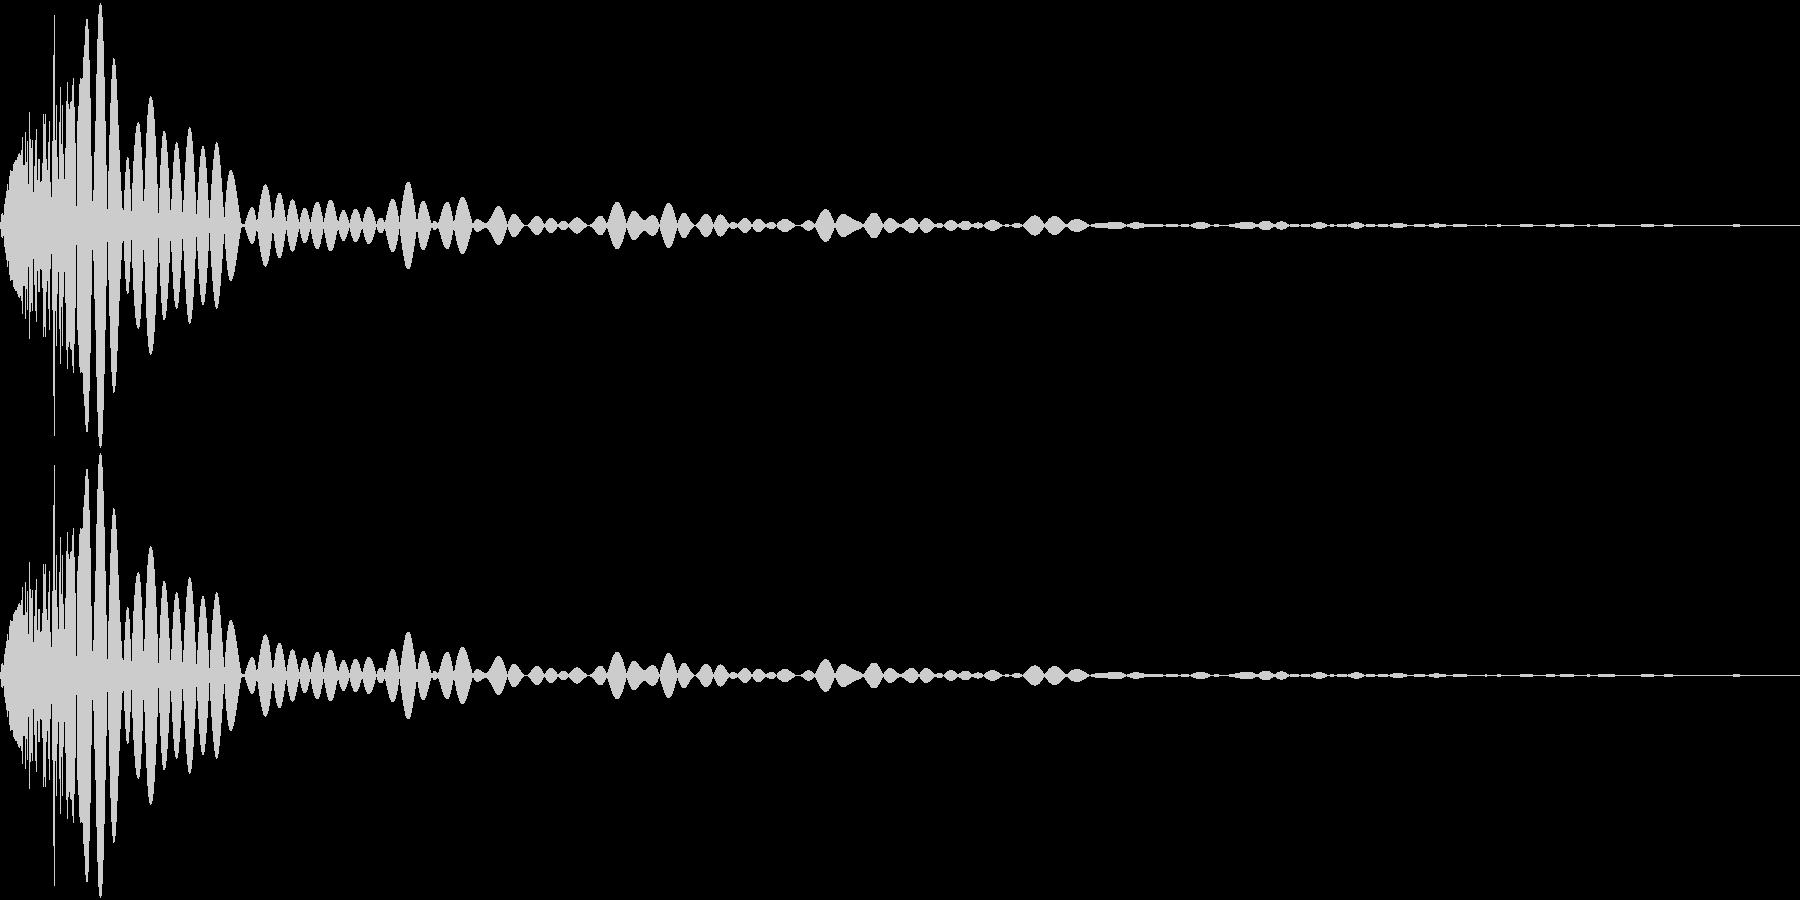 DTM Tom 4 オリジナル音源の未再生の波形